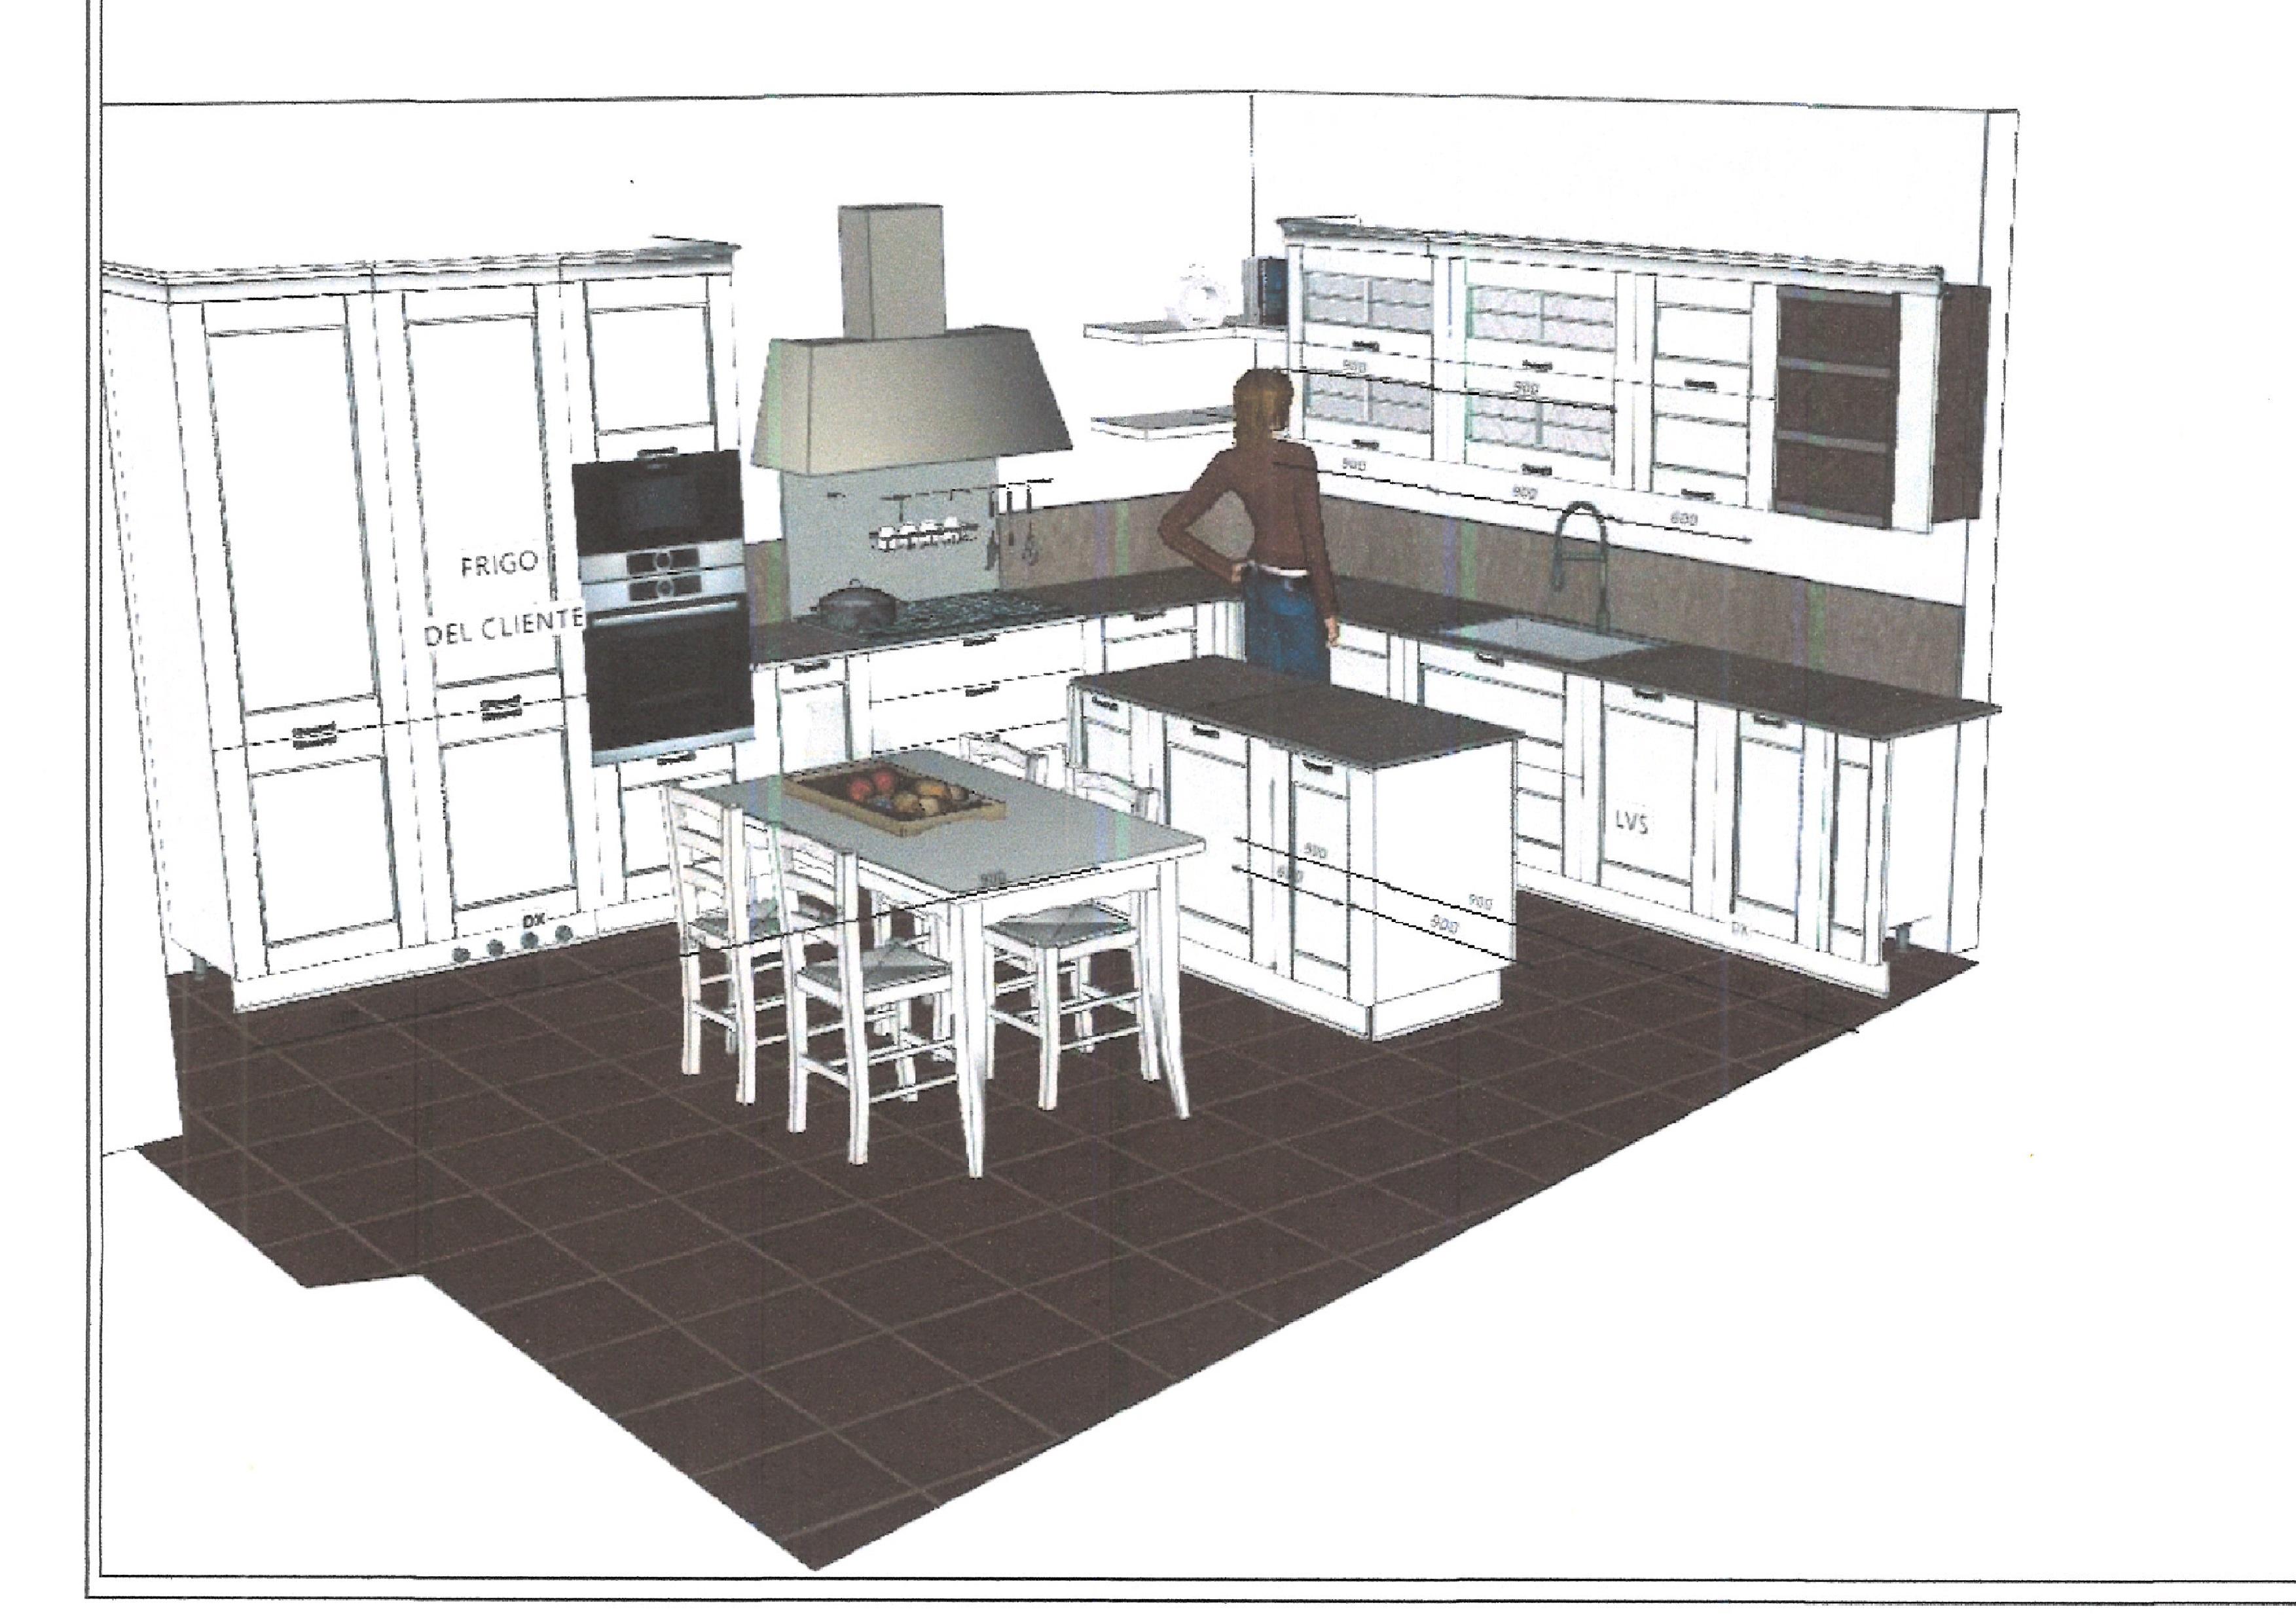 Forum arredamento u consiglio illuminazione cucina